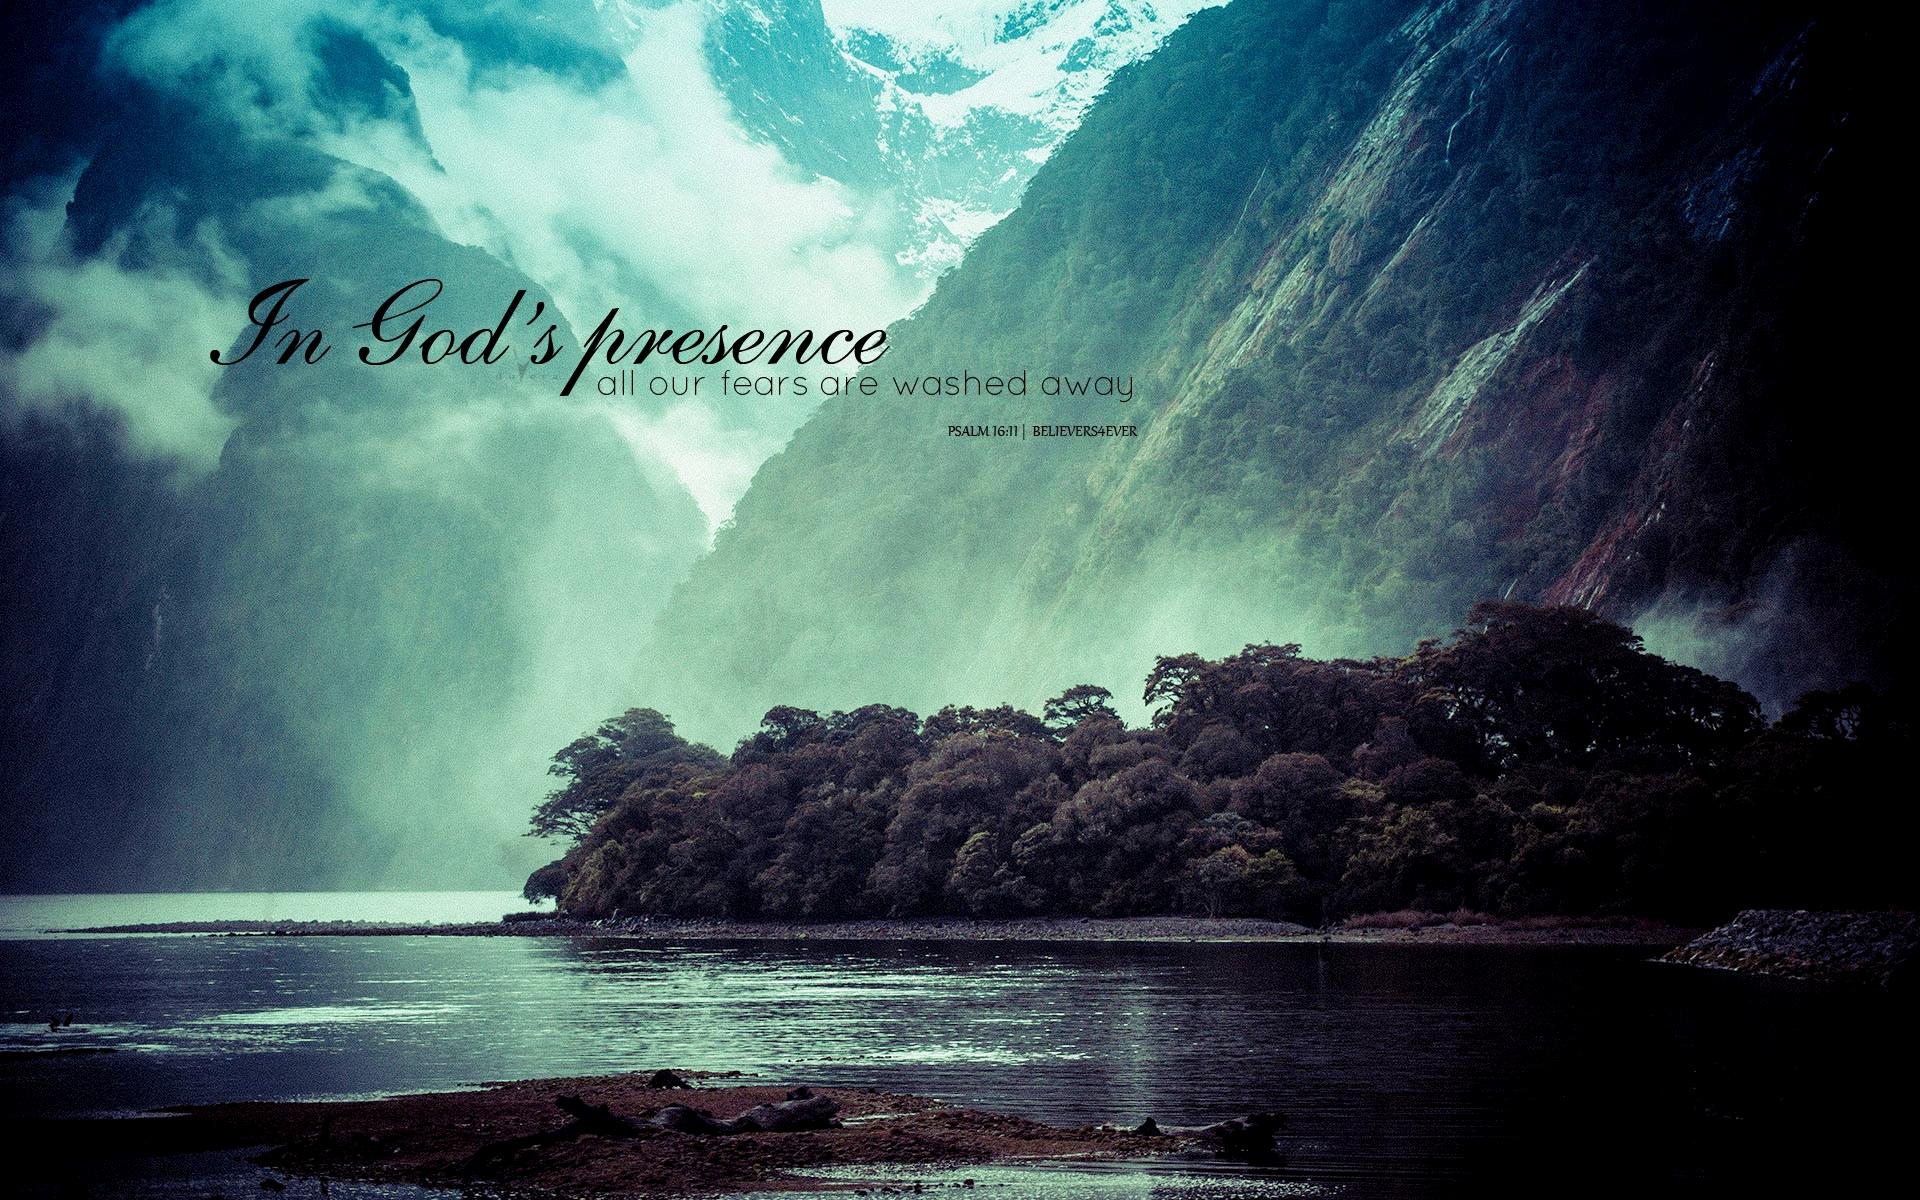 desktop-backgrounds-religious-Download-Free-Christian-with-regard-to-Desktop-Backgrou-wallpaper-wpc9004171